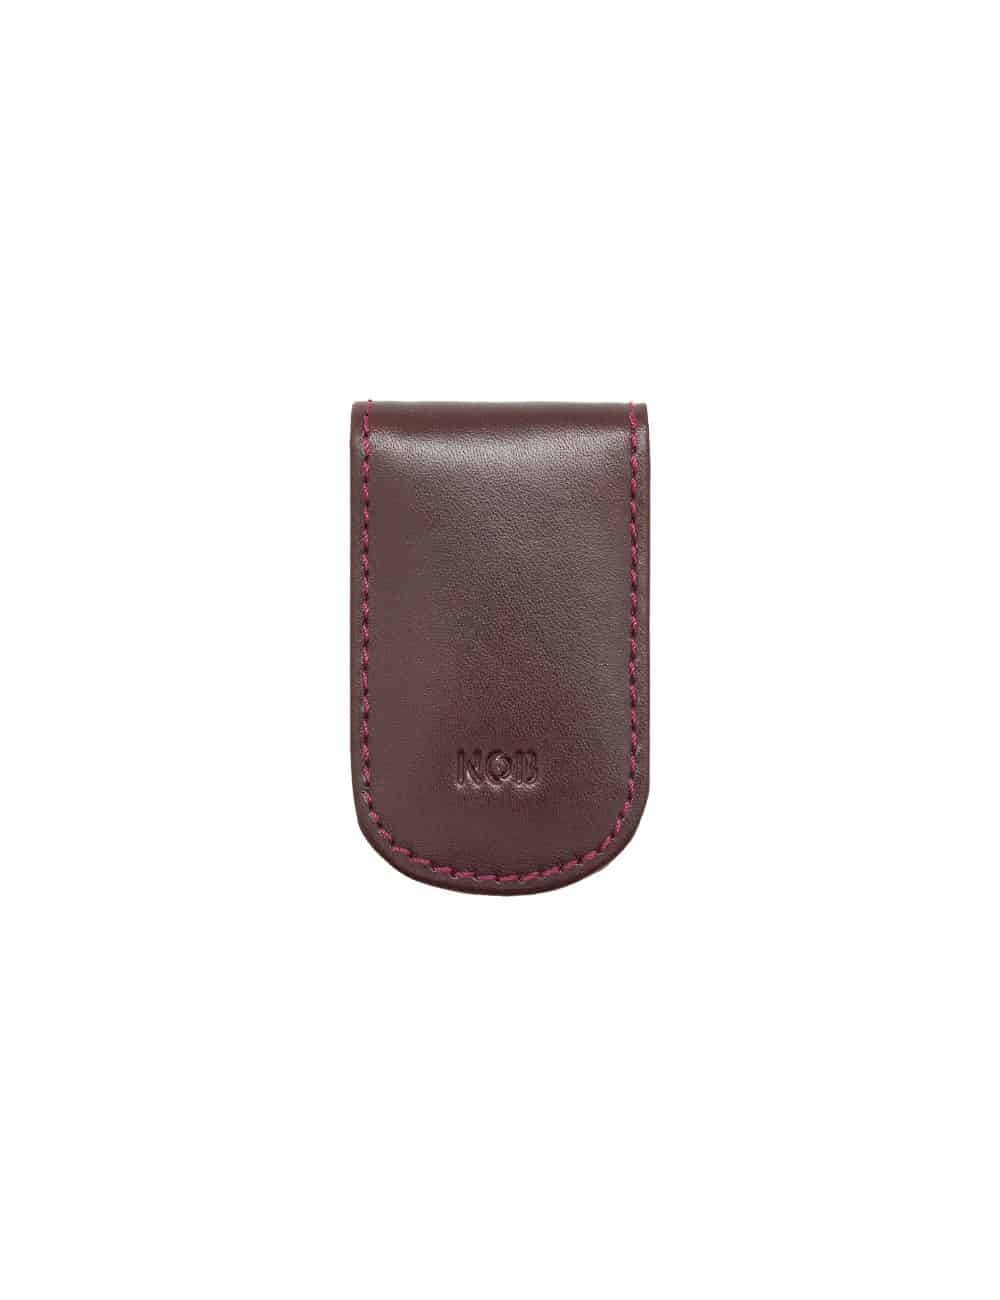 Burgundy 100% Genuine Top Grain Leather Money Clip SLG4.NOB1